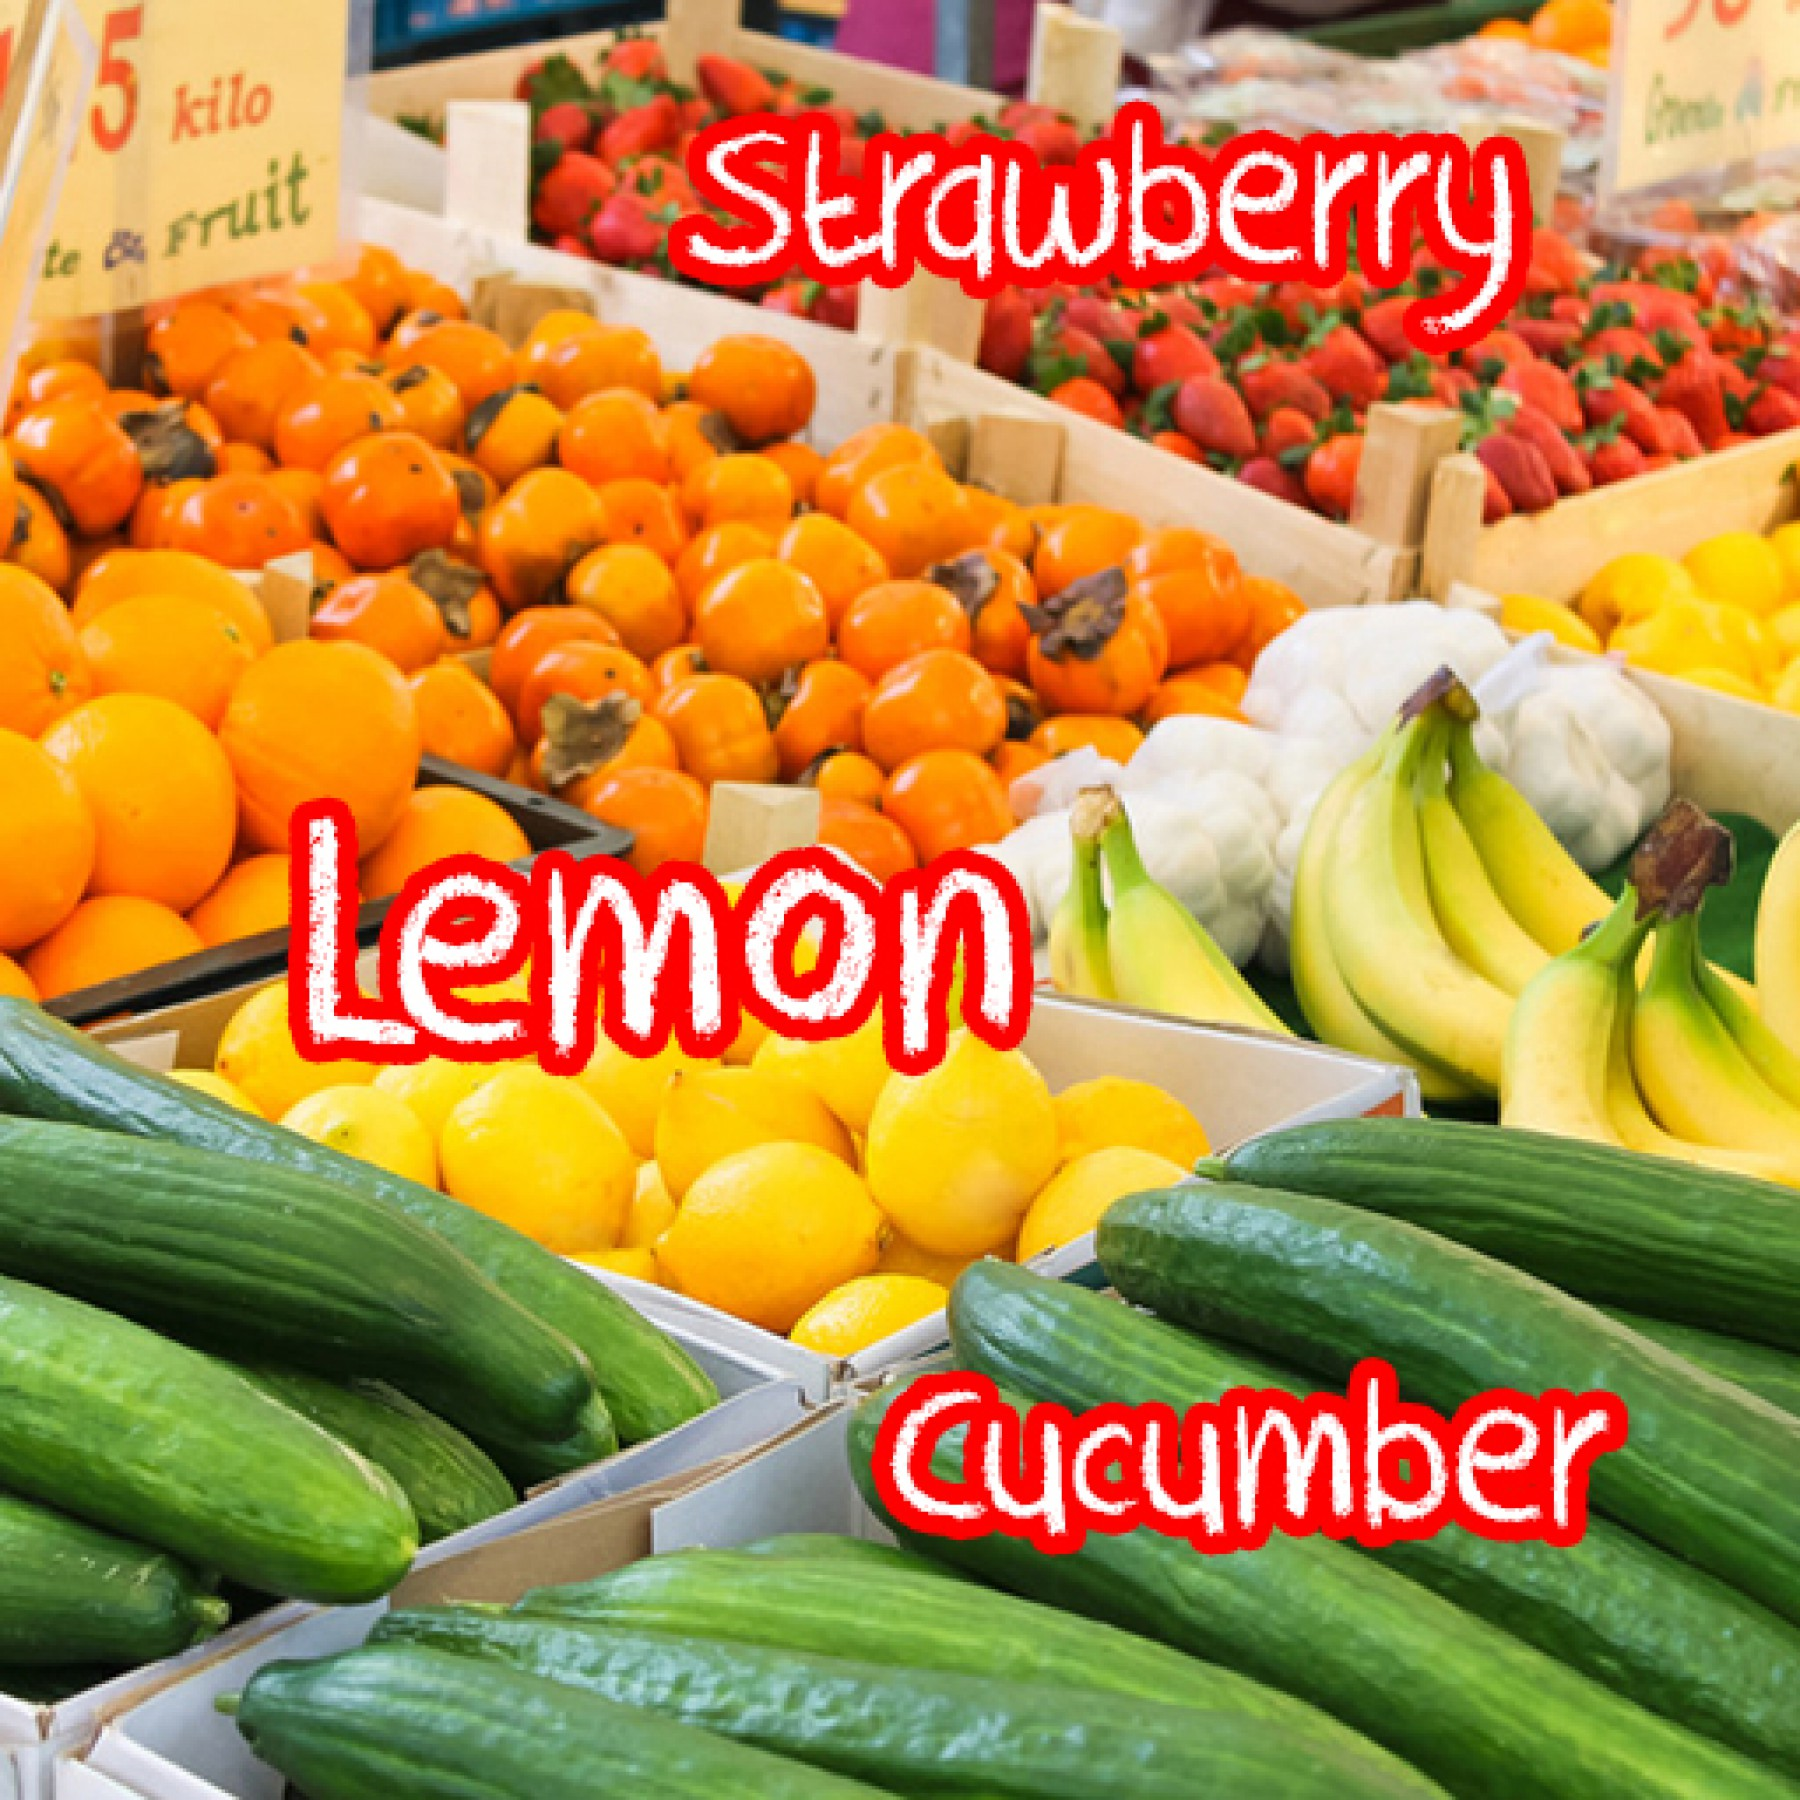 fruit-veg-symbols-food-drink-kids-languages-life-skills-communication-education-main-location1